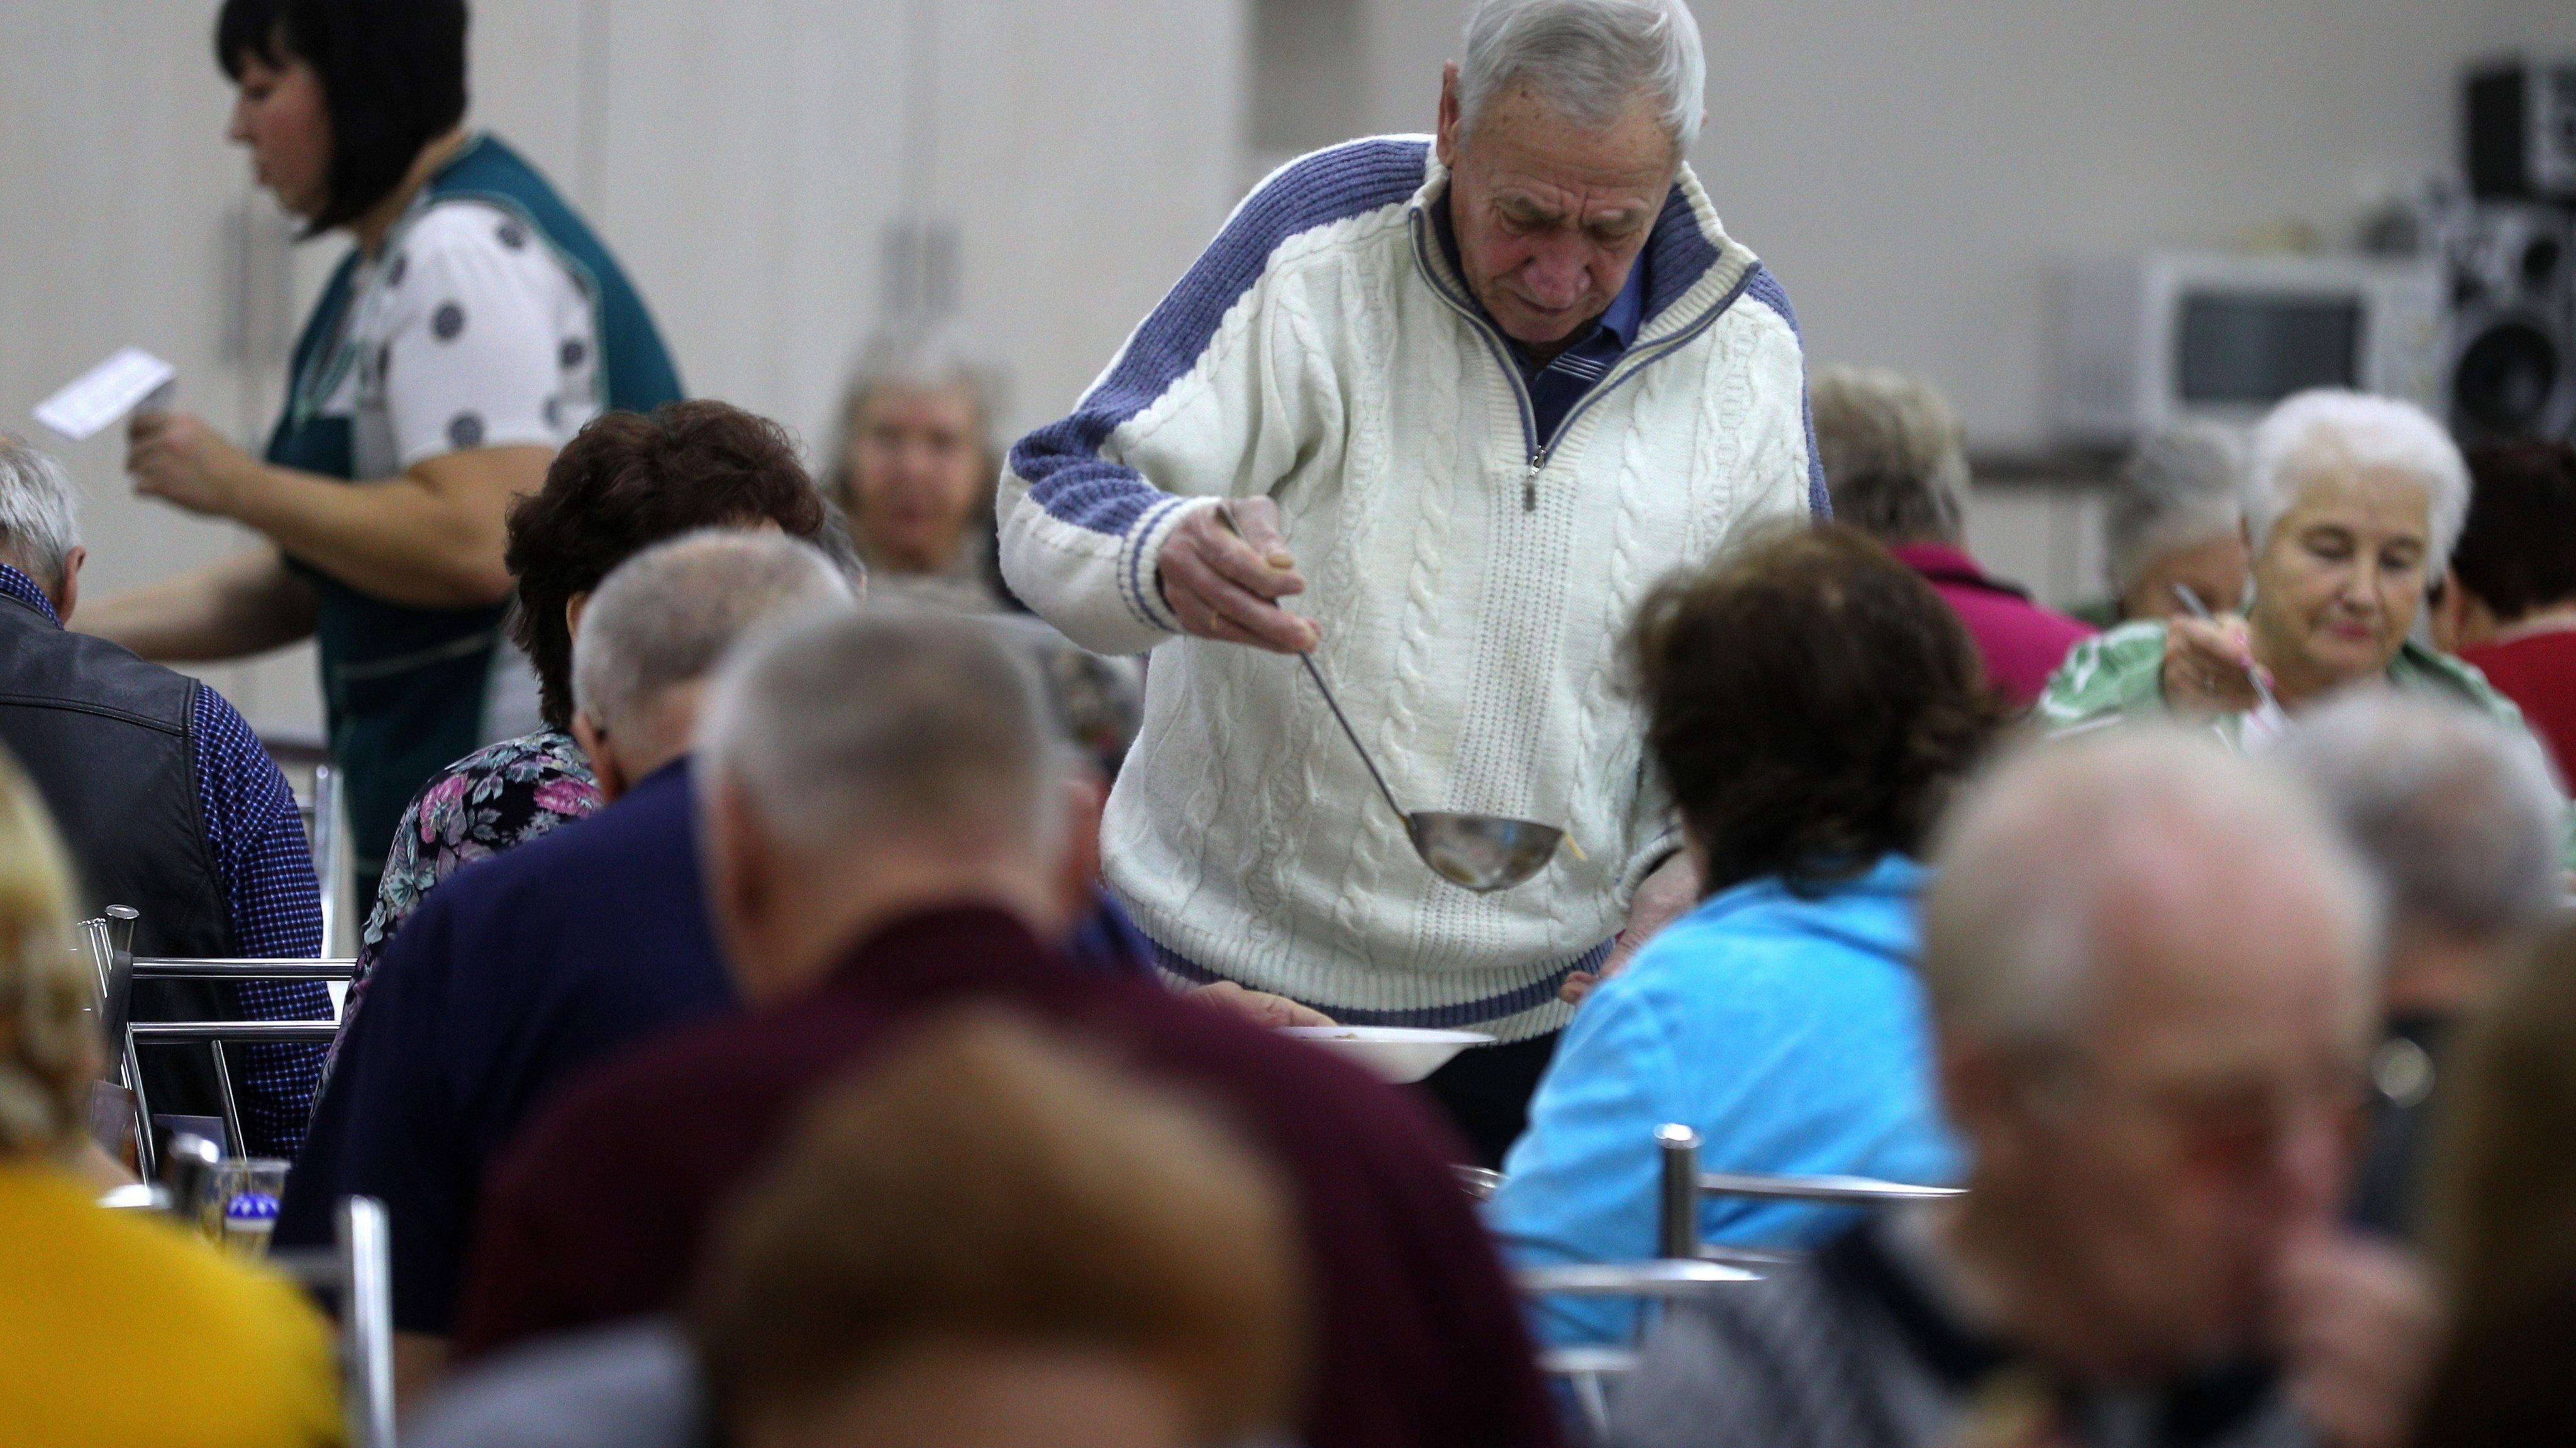 Vtoroye Dykhaniye health and leisure programme for elderly people in Yaroslavl Region, Russia